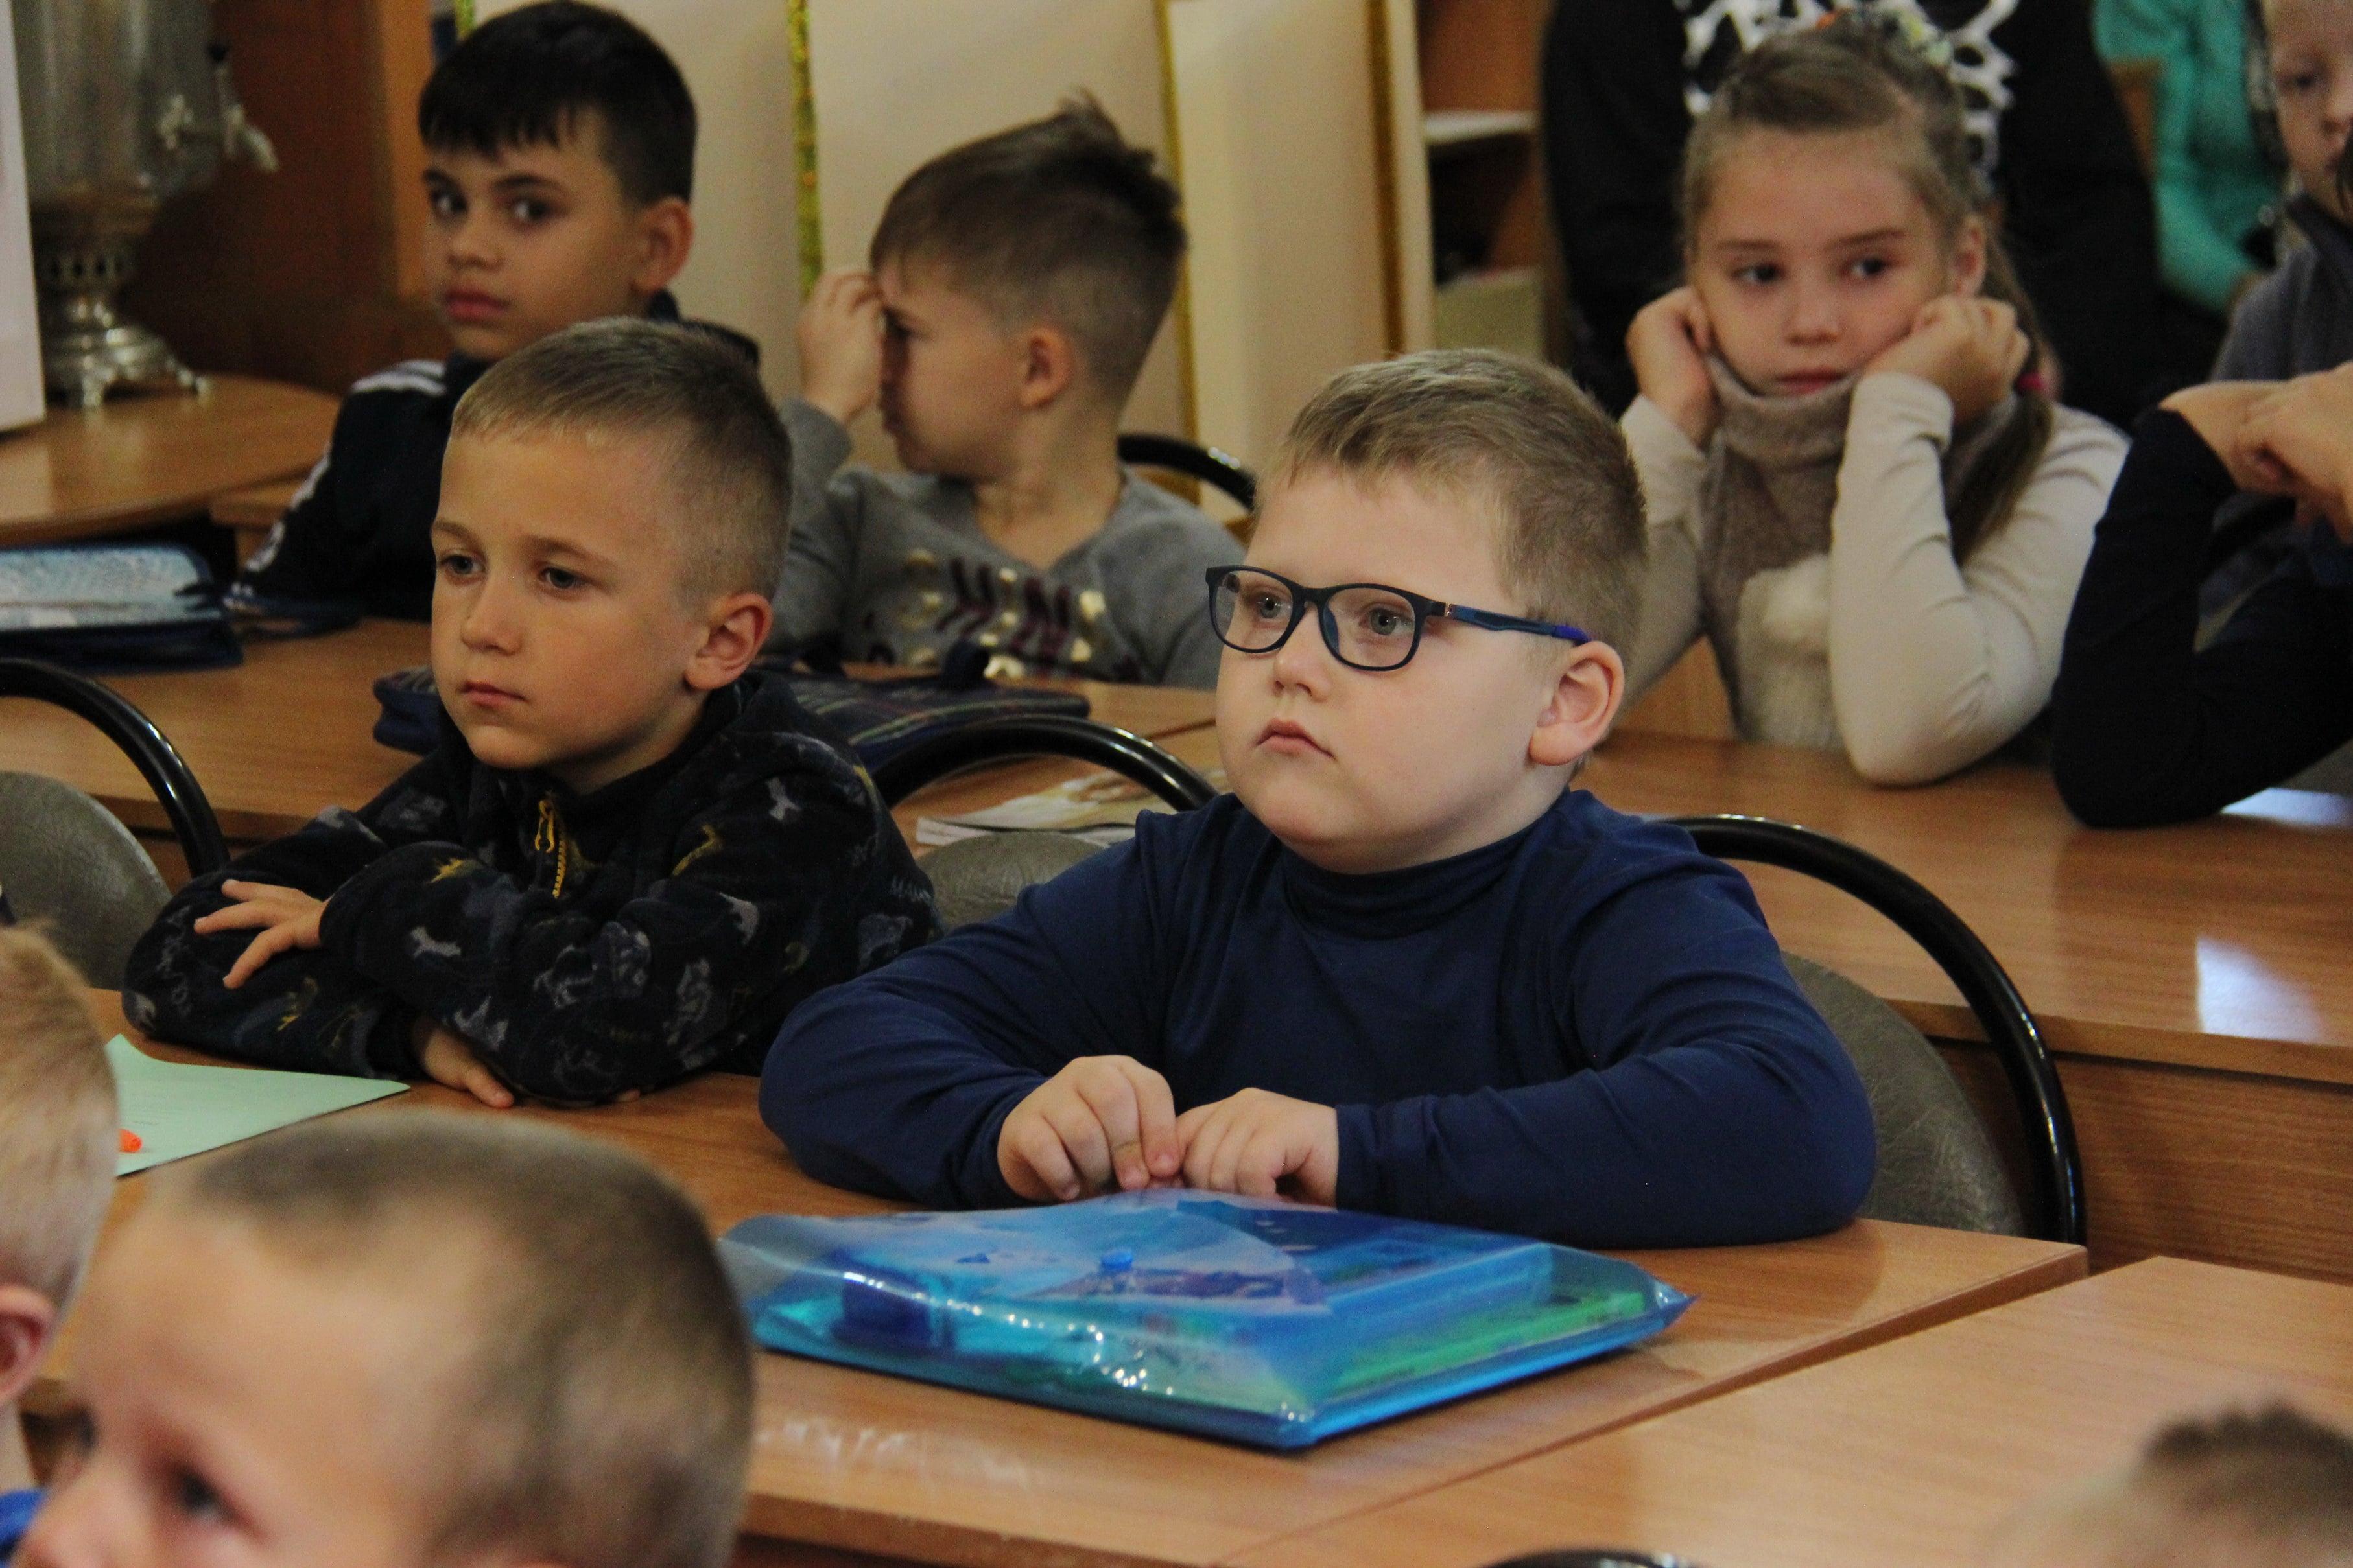 http://monuspen.ru/photoreports/88c681a8ee7fcb437fe27af18a17a71g.JPG